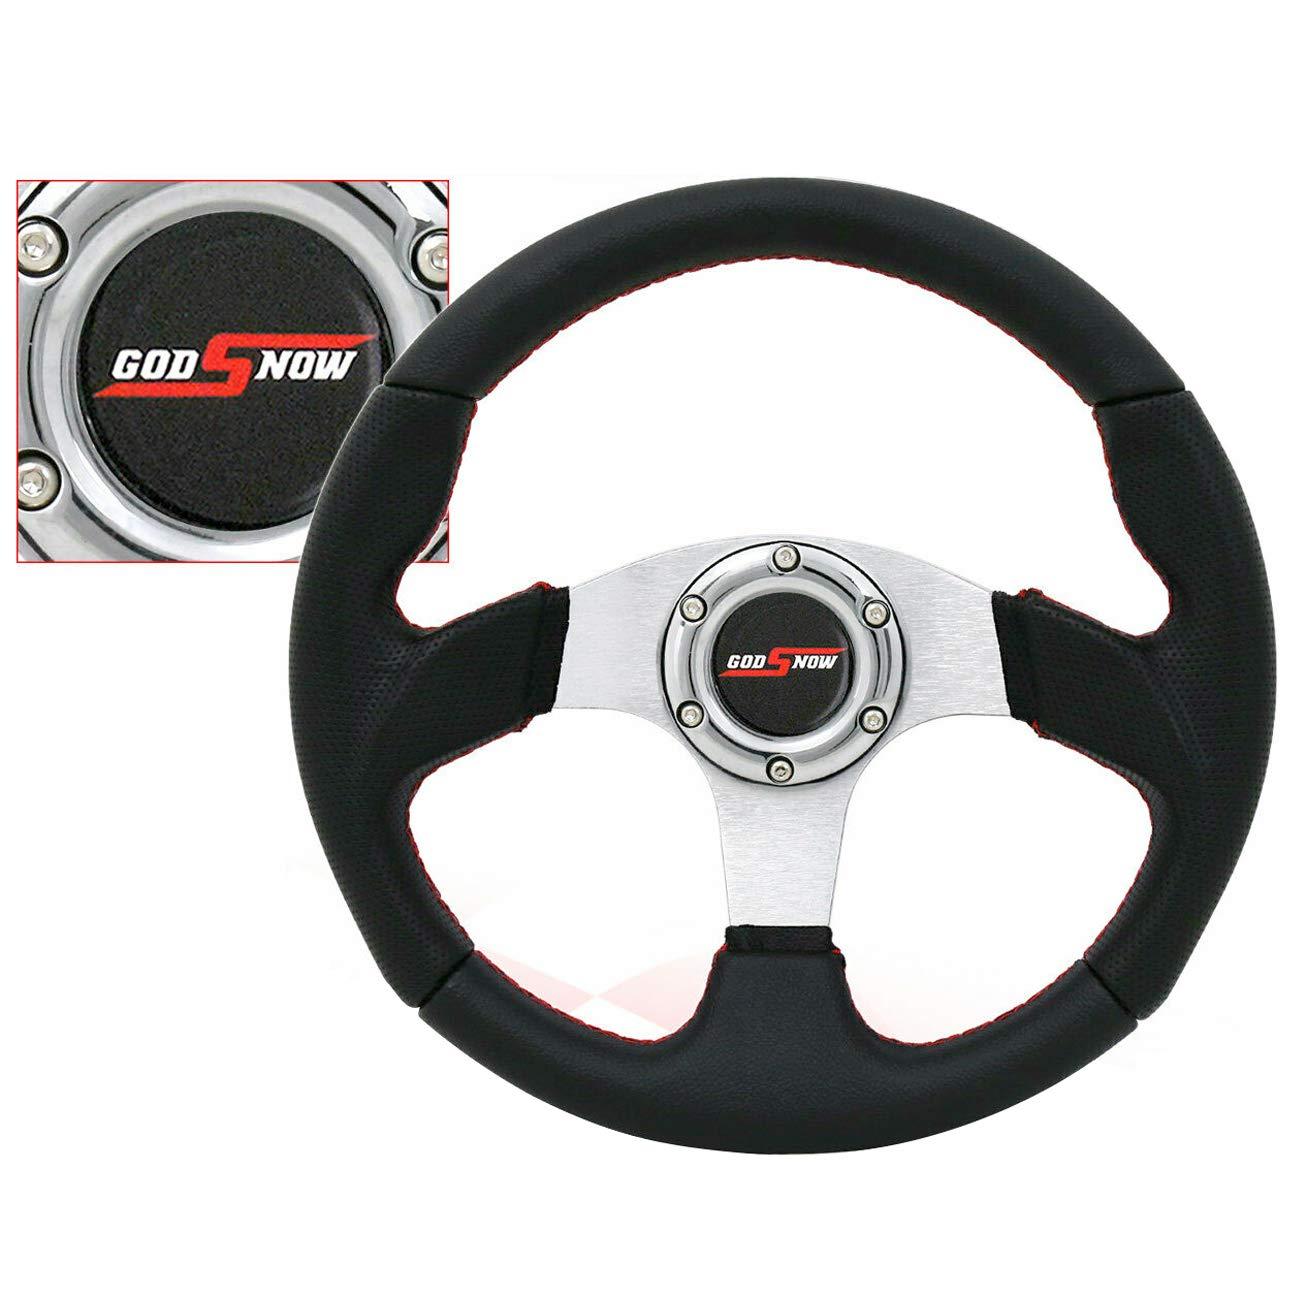 Rxmotor Universal Fit 320mm JDM Battle Racing Flat Steering Wheel New (Black v1)